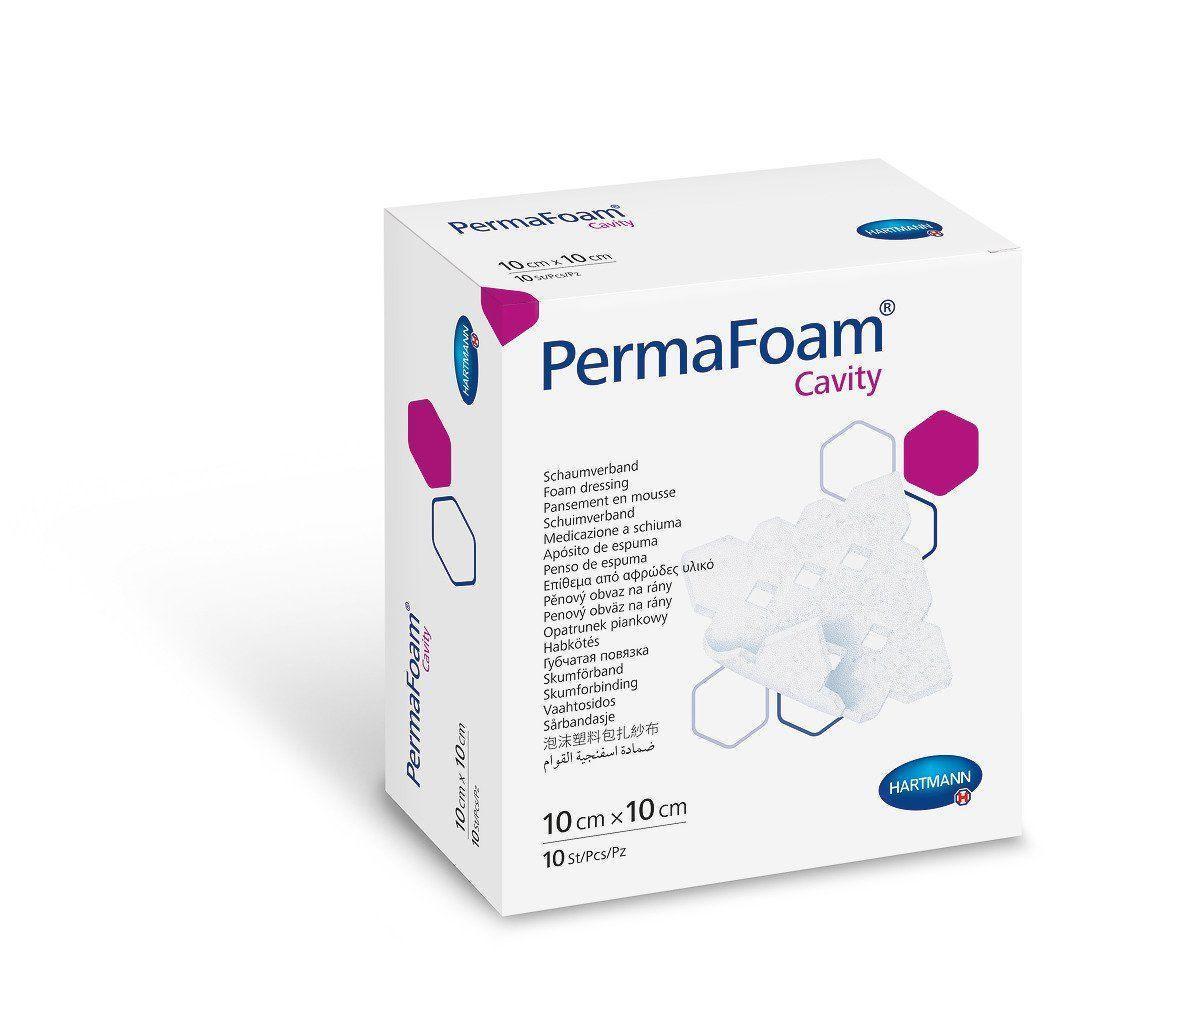 PermaFoam Cavity 10х10 см Губчатая повязка для тампонирования глубоких ран